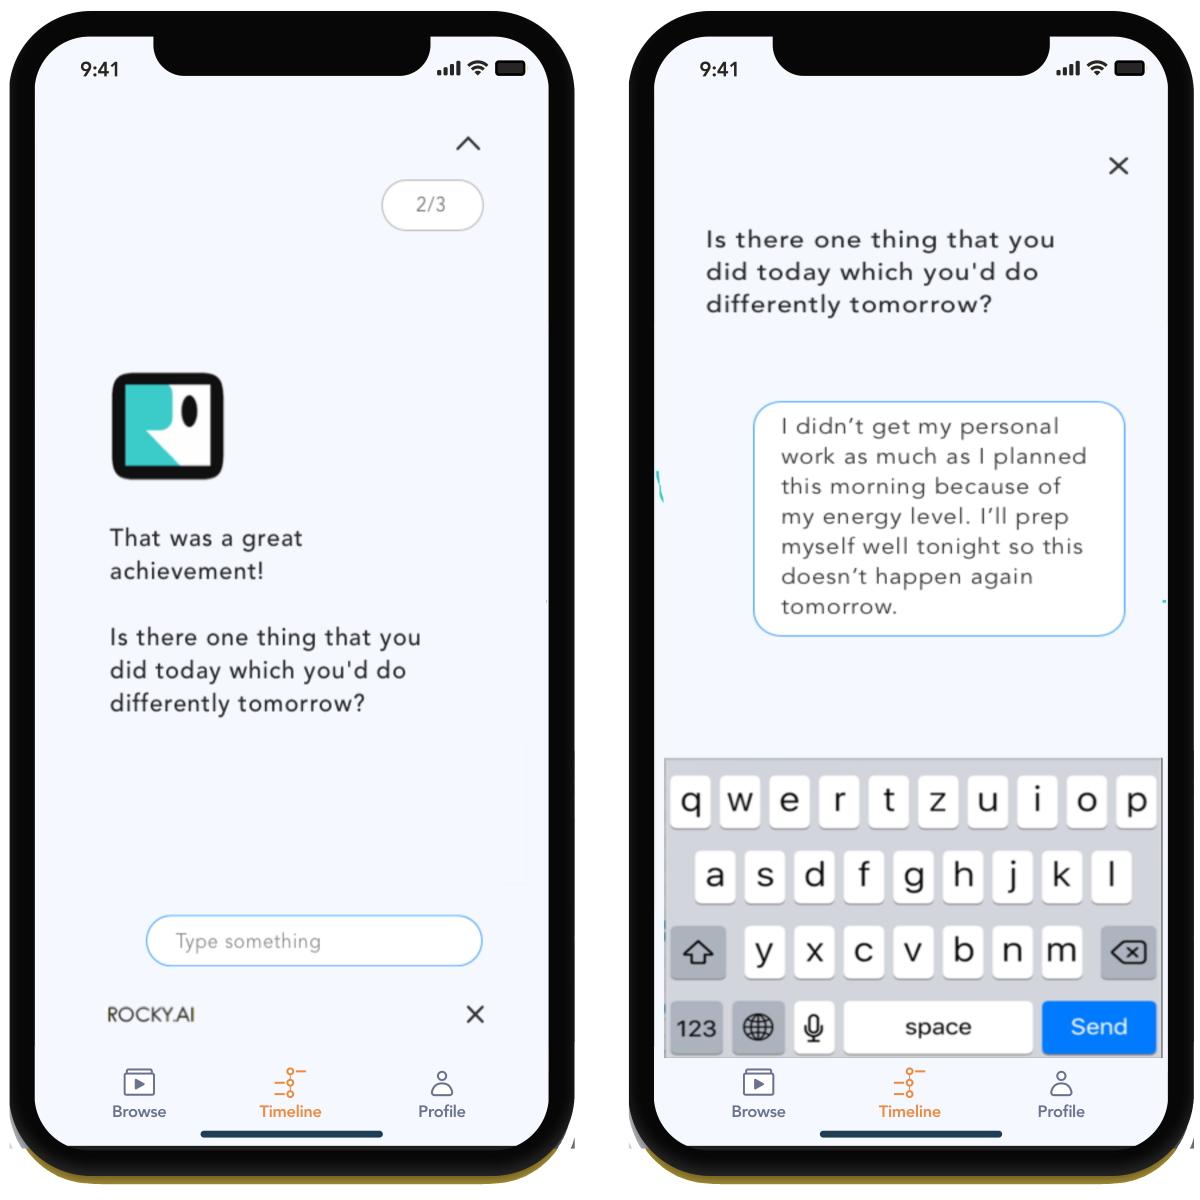 Chatbot ROCKY.AI Artificial Intelligence